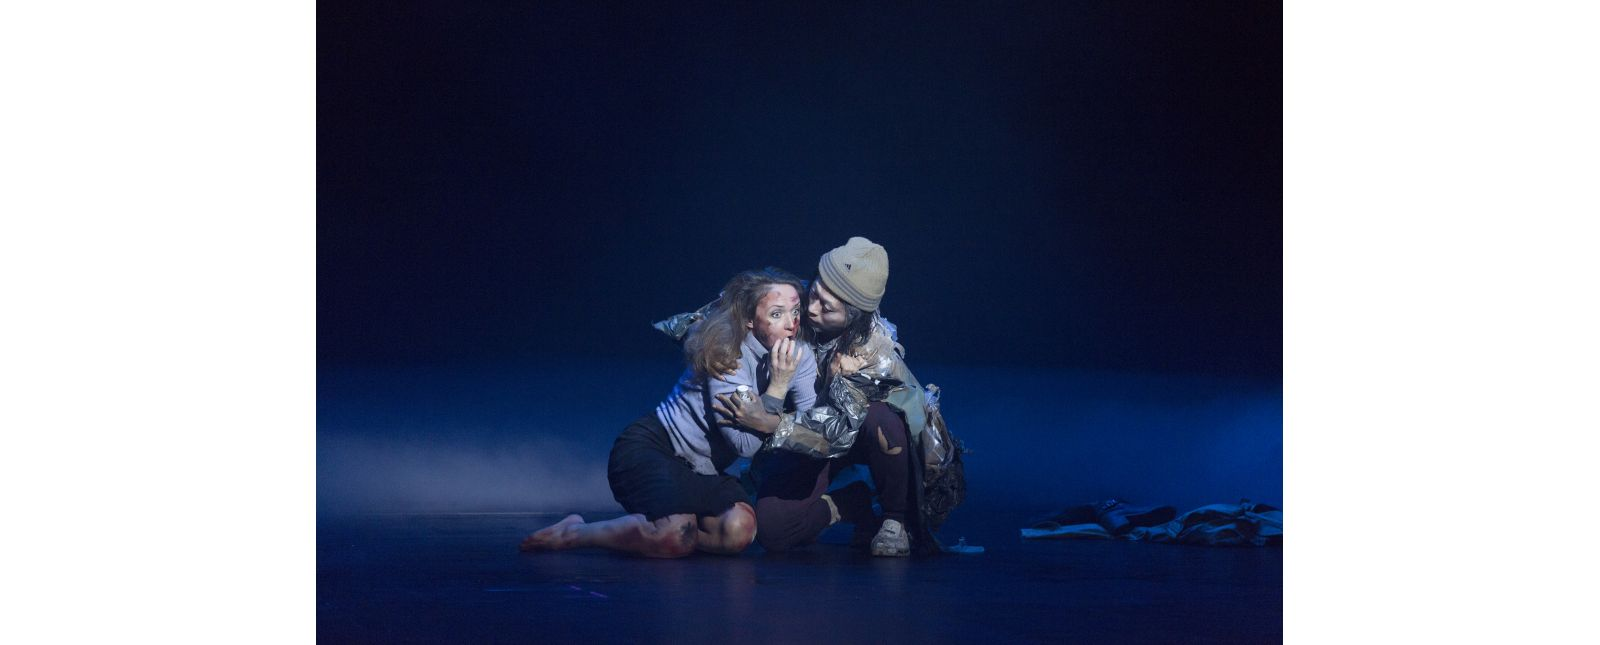 Katja Kabanowa // Anna-Maria Kalesidis, Jin Seok Lee // Rainer Muranyi // 2018